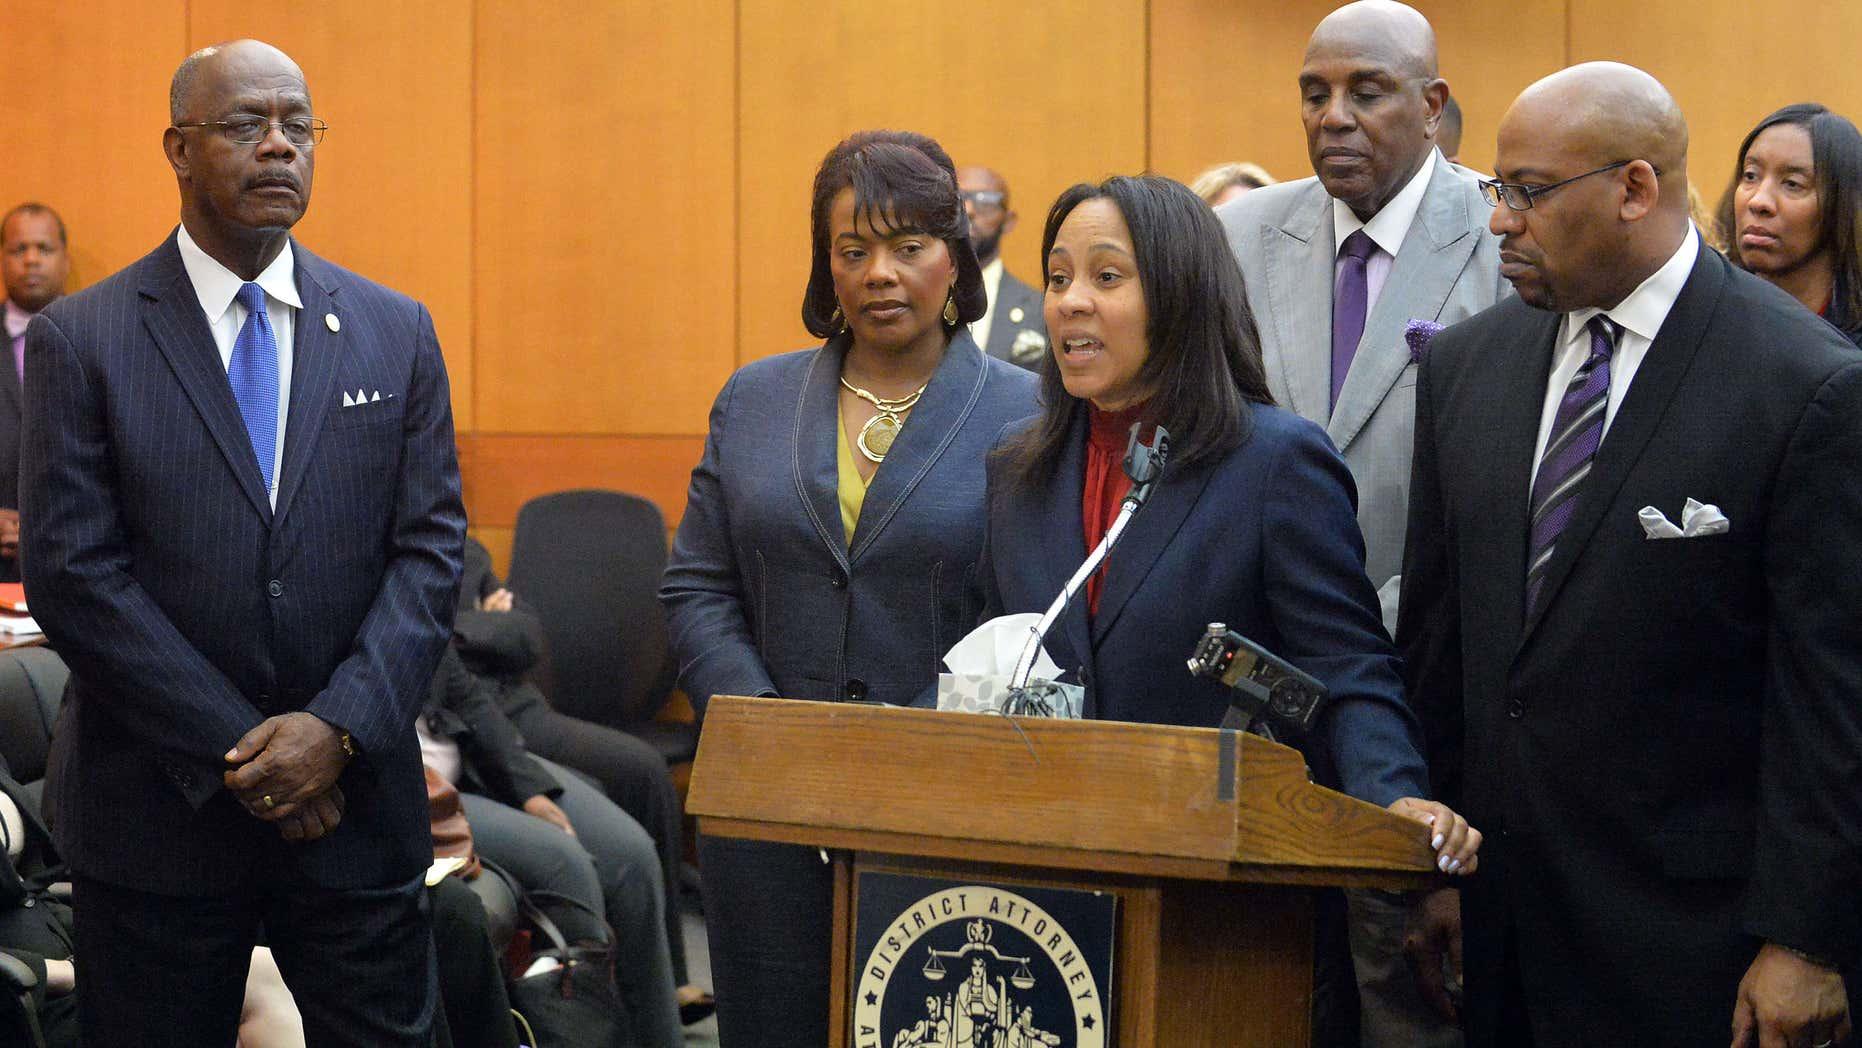 Cheating Case In Atlanta : Closing arguments begin in test cheating trial of atlanta